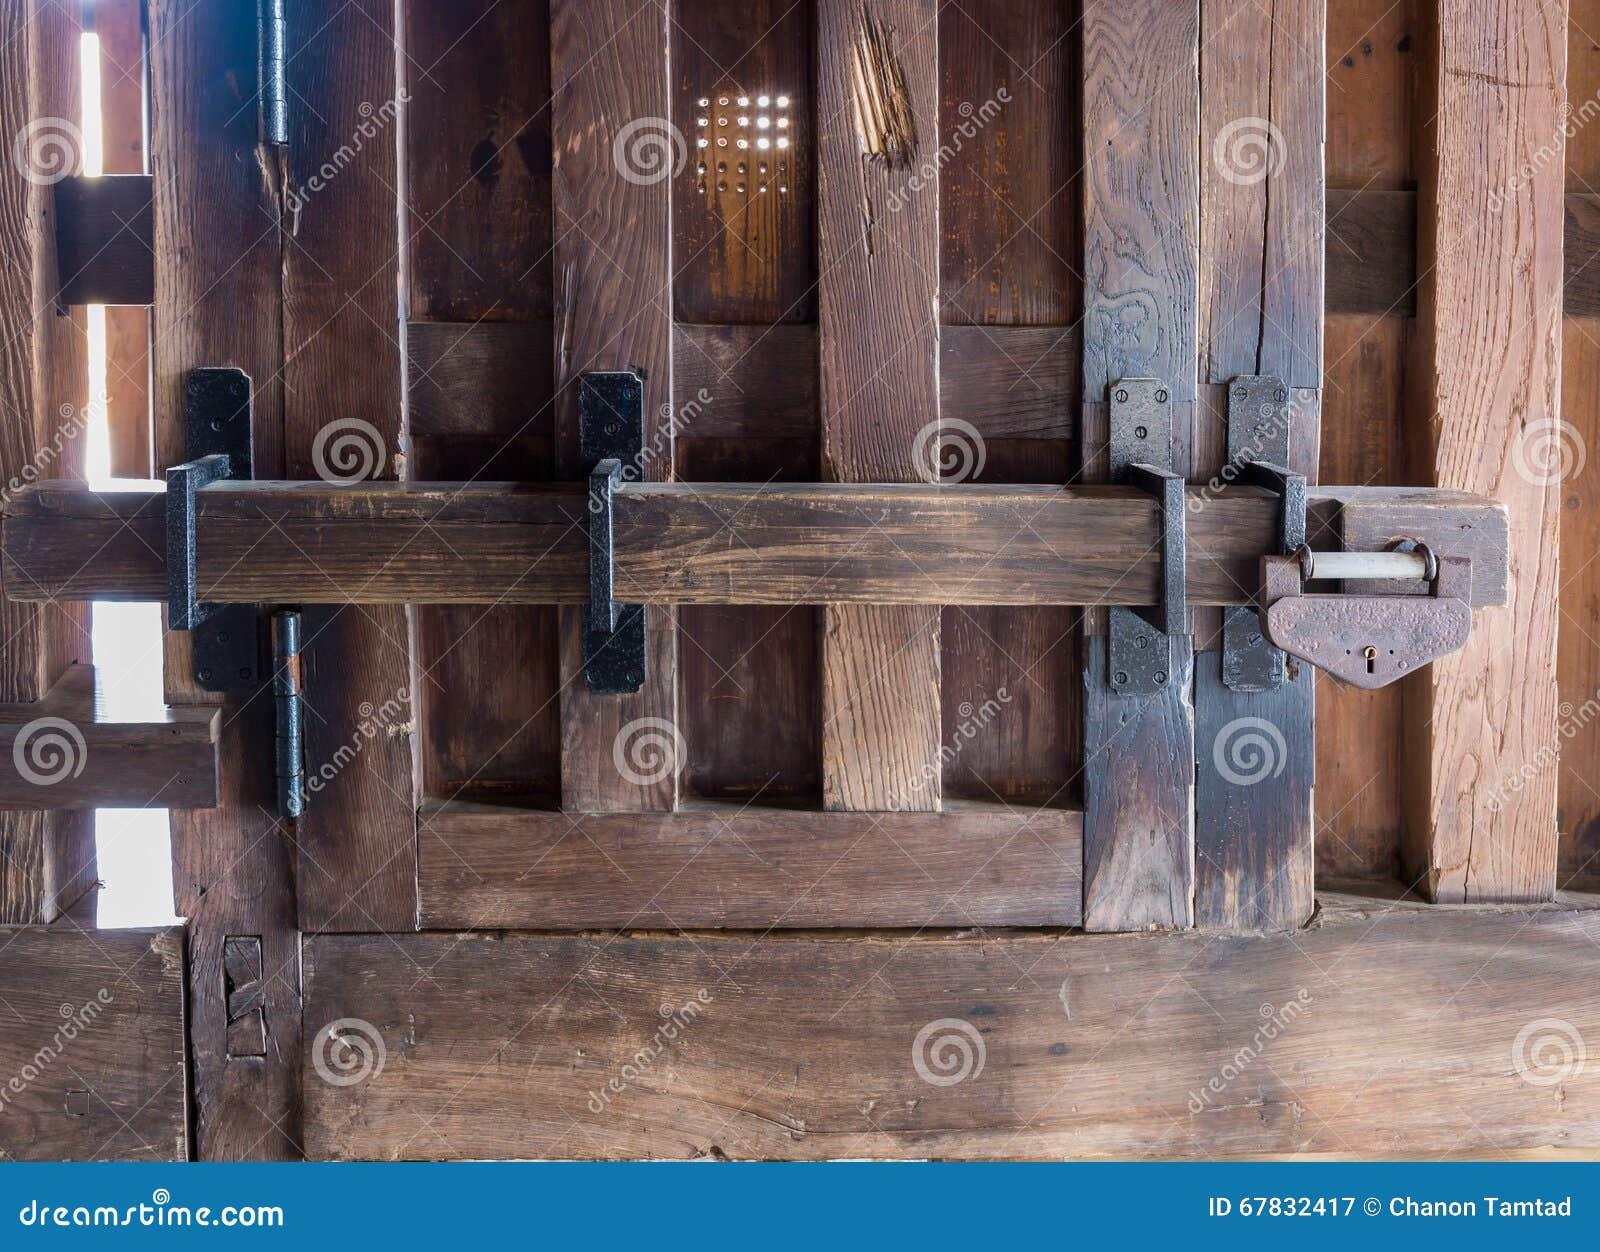 Old Prison Locked Wooden Key Gate Lock Stock Image